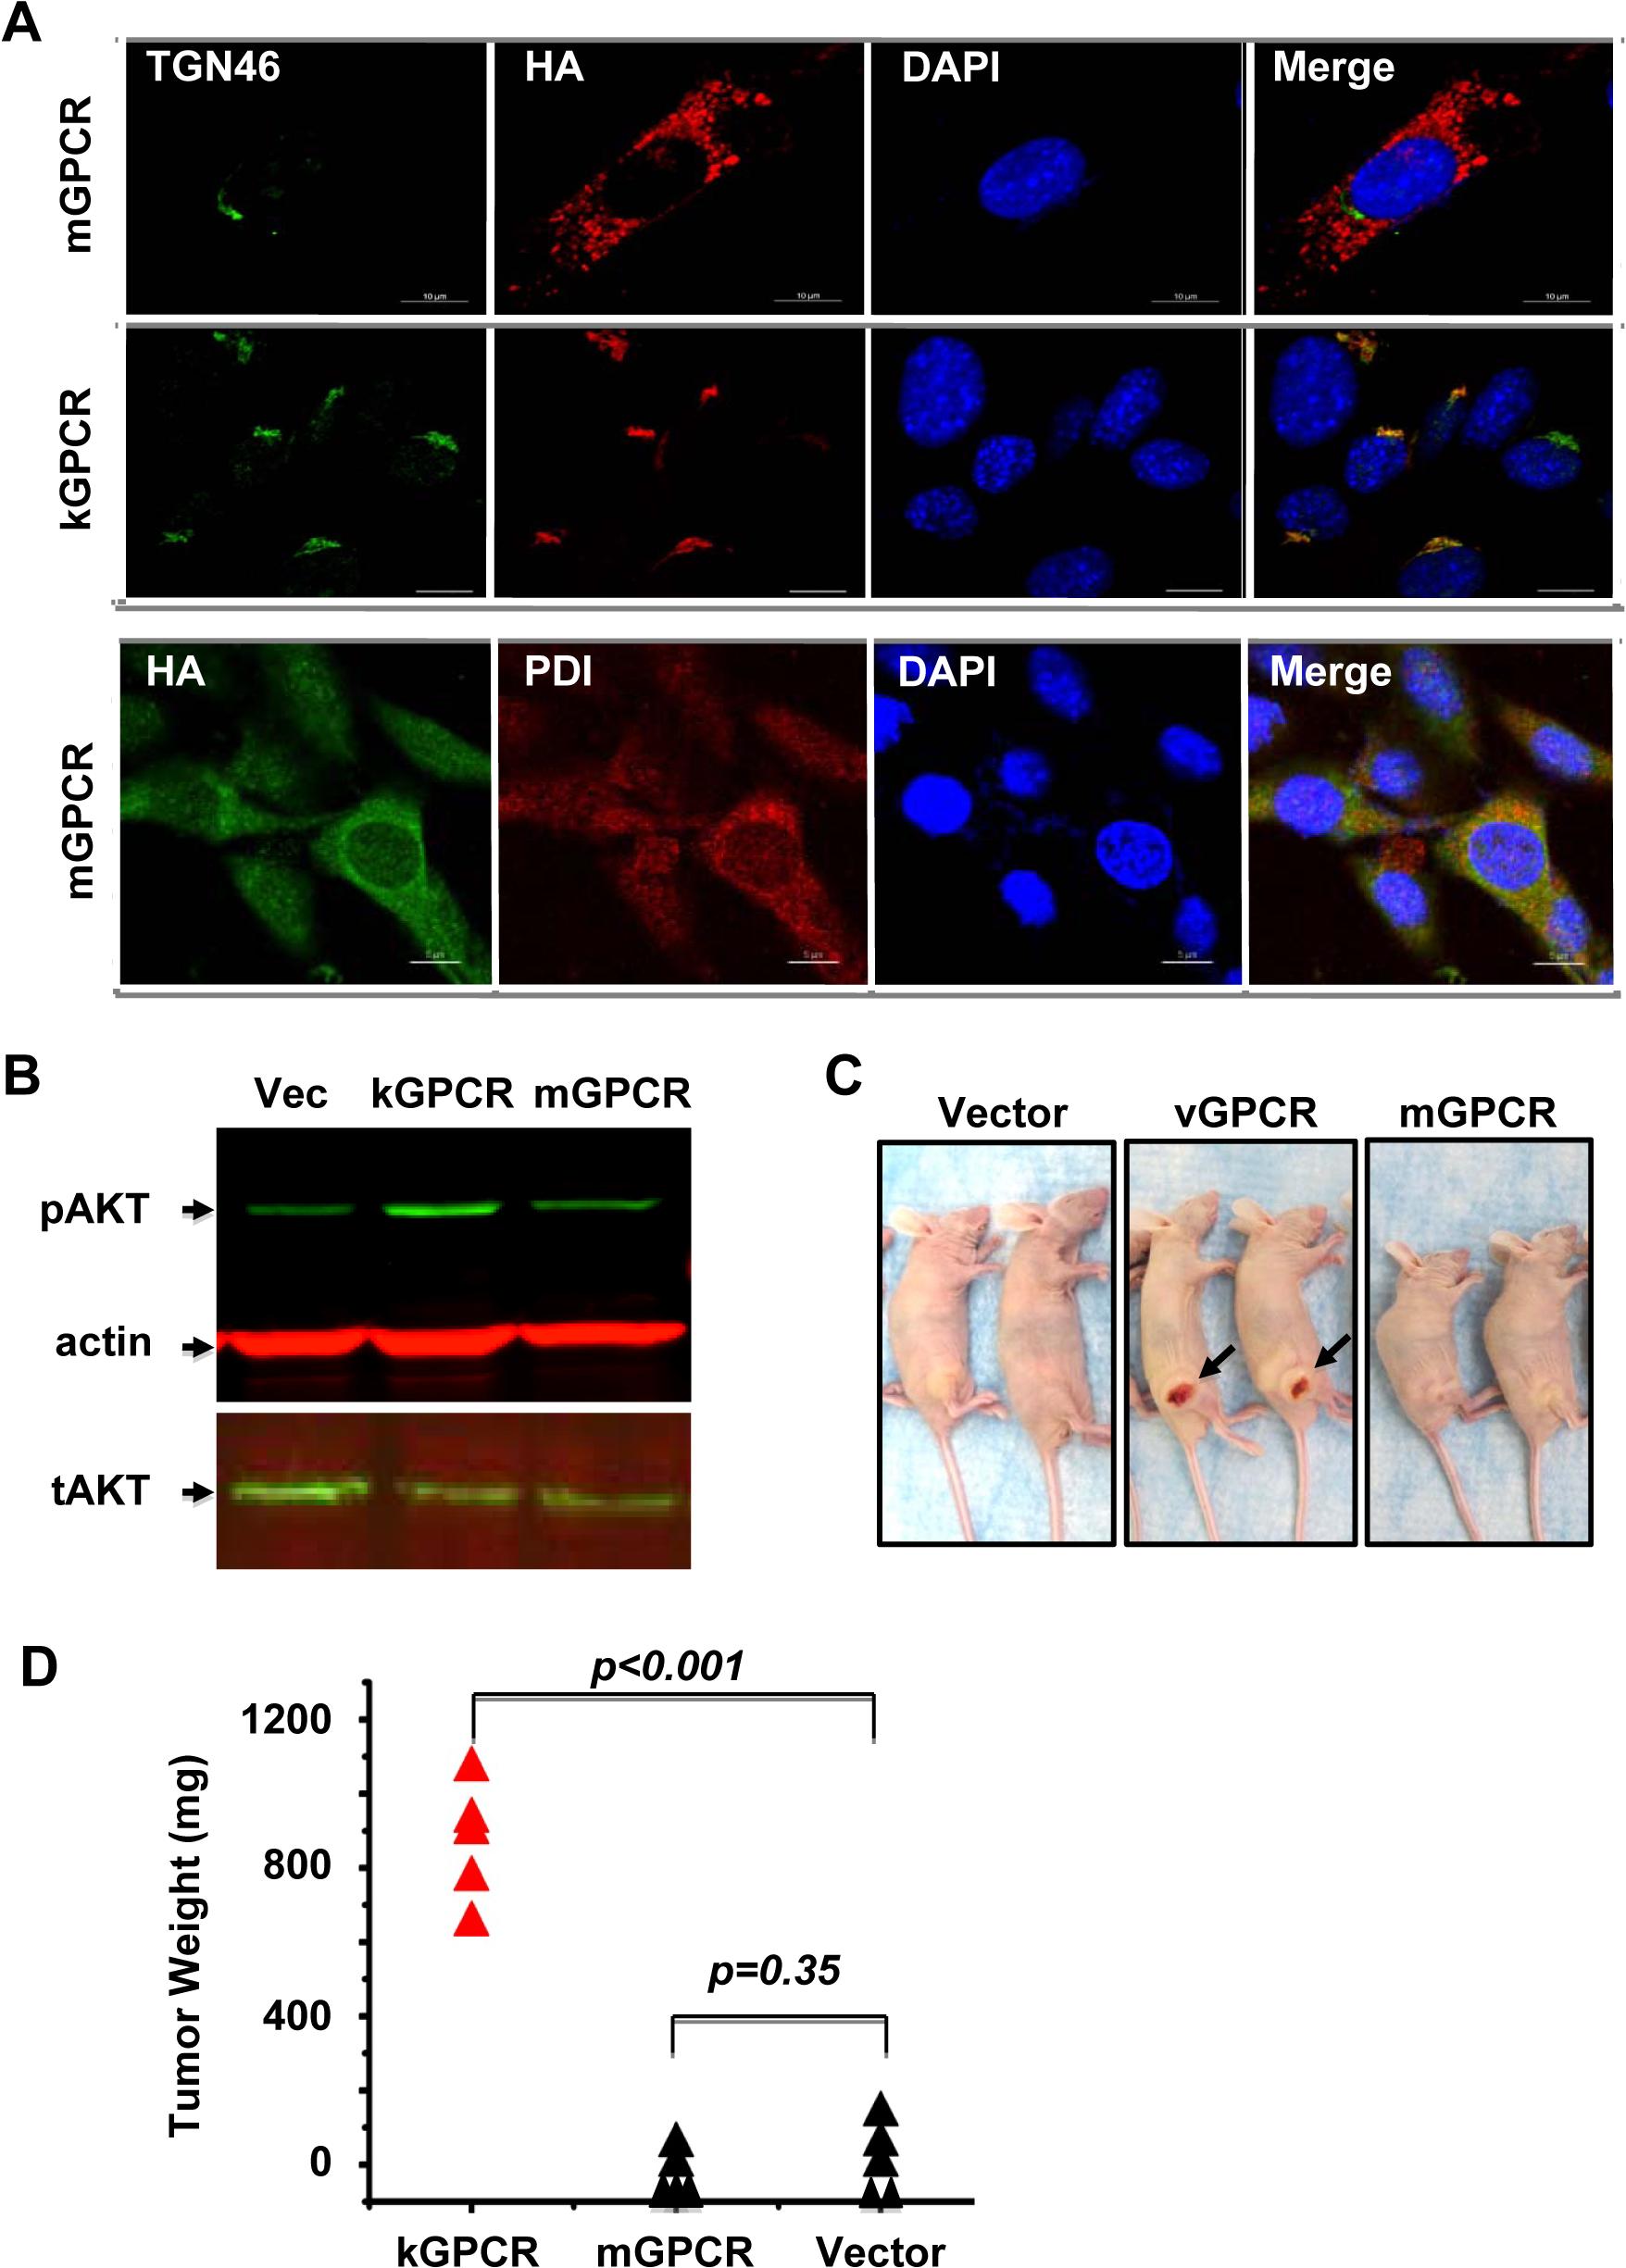 Differential signaling and tumorigenic capacity of kGPCR and mGPCR.